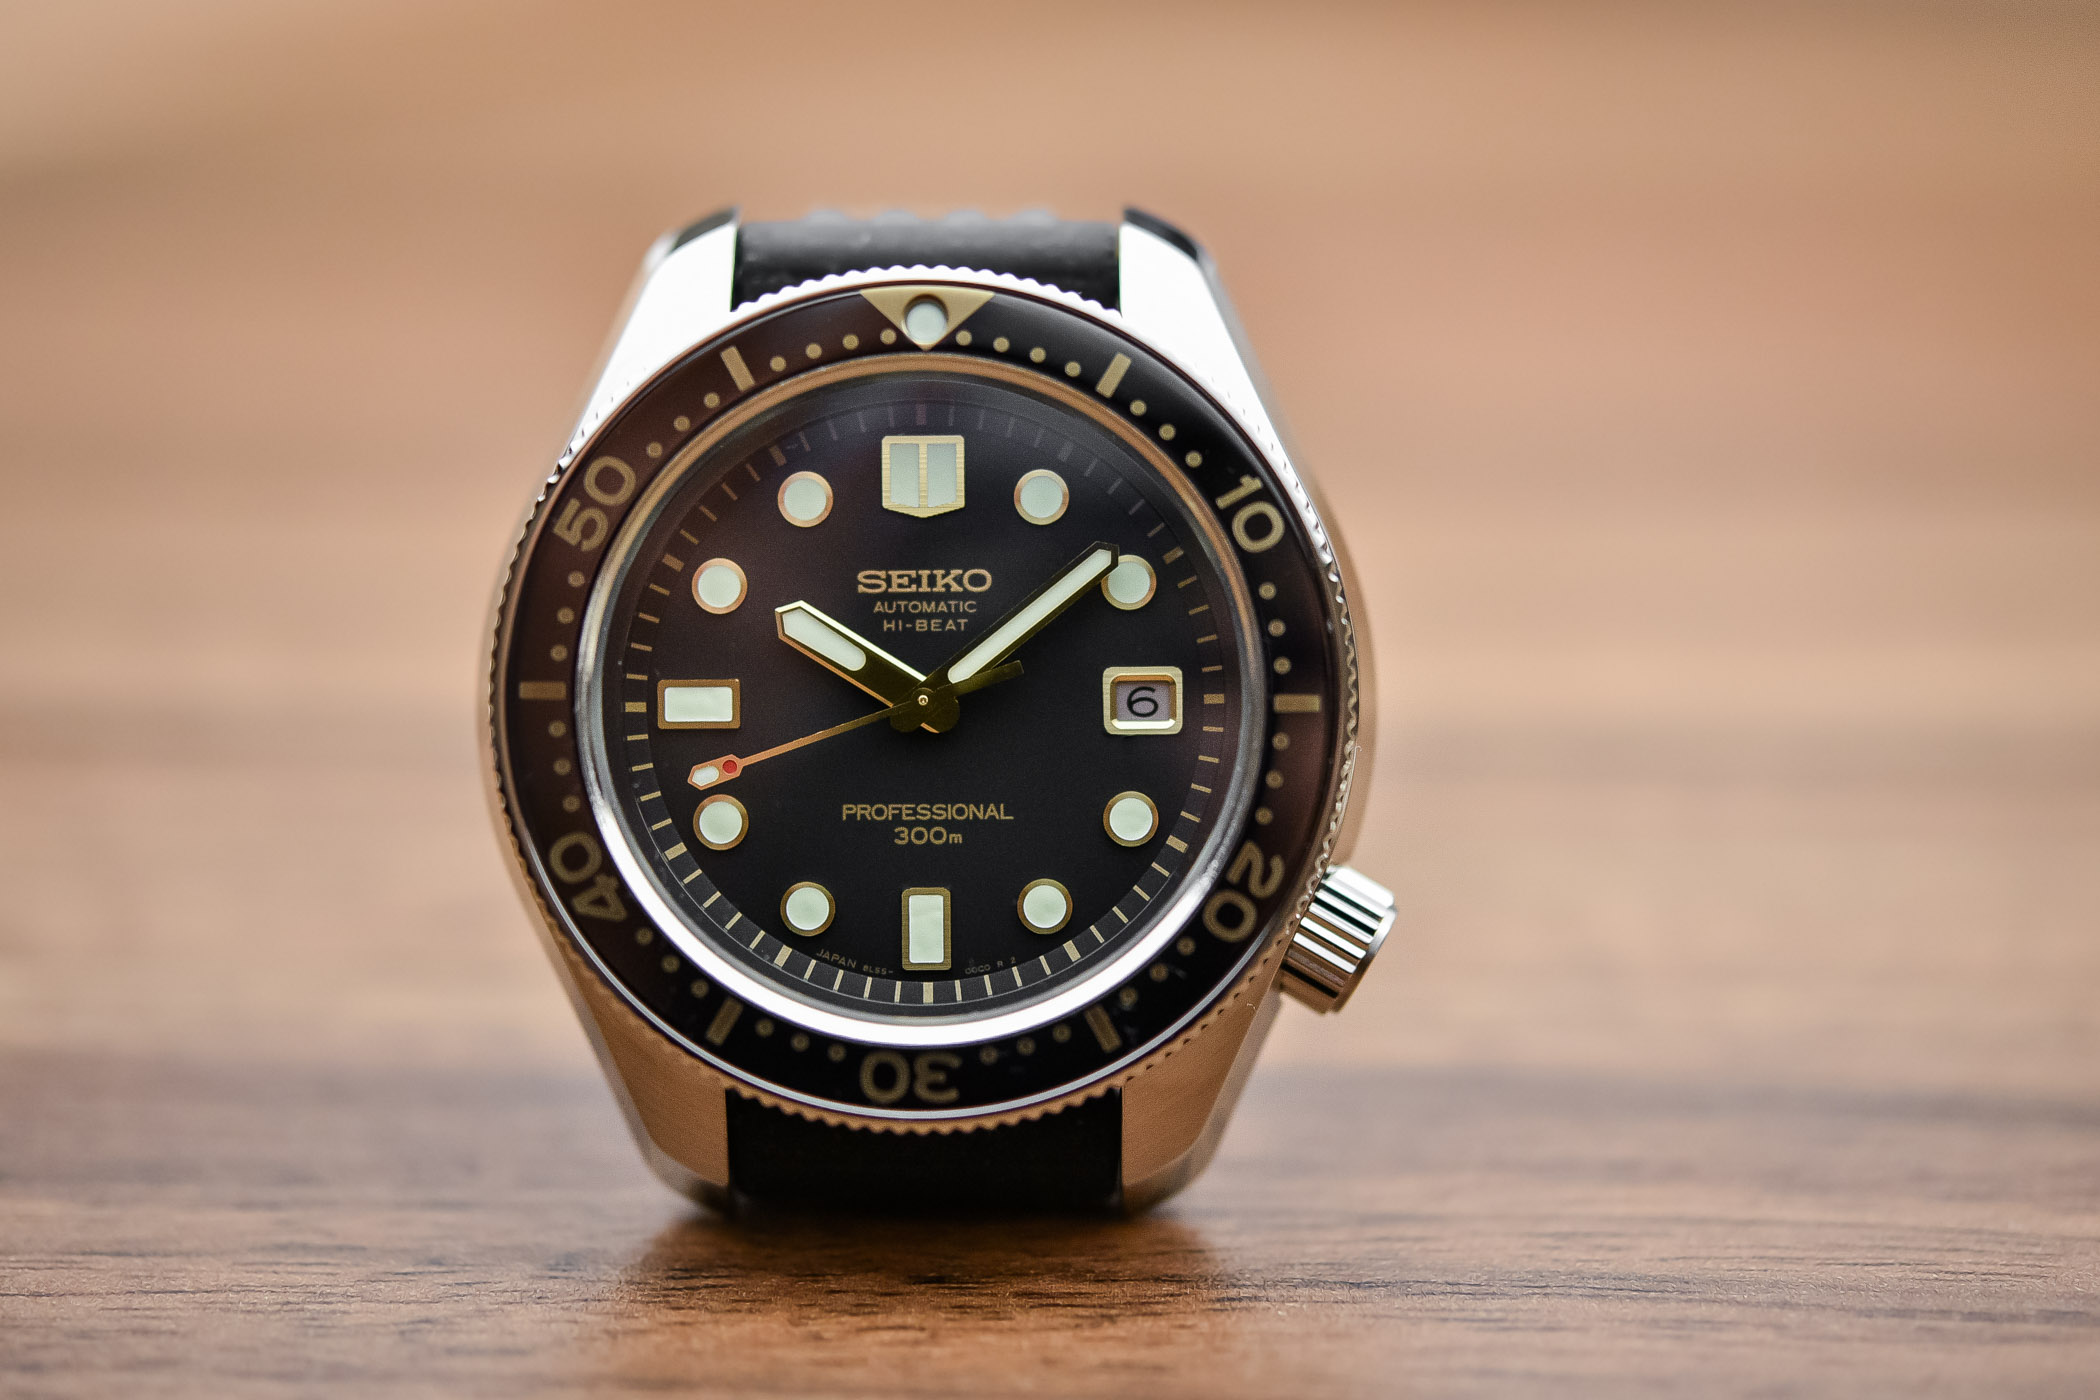 2da543ce71b Seiko Prospex Diver 300m Hi-Beat SLA025 – Recreation 1968 Ref. 6159-7001